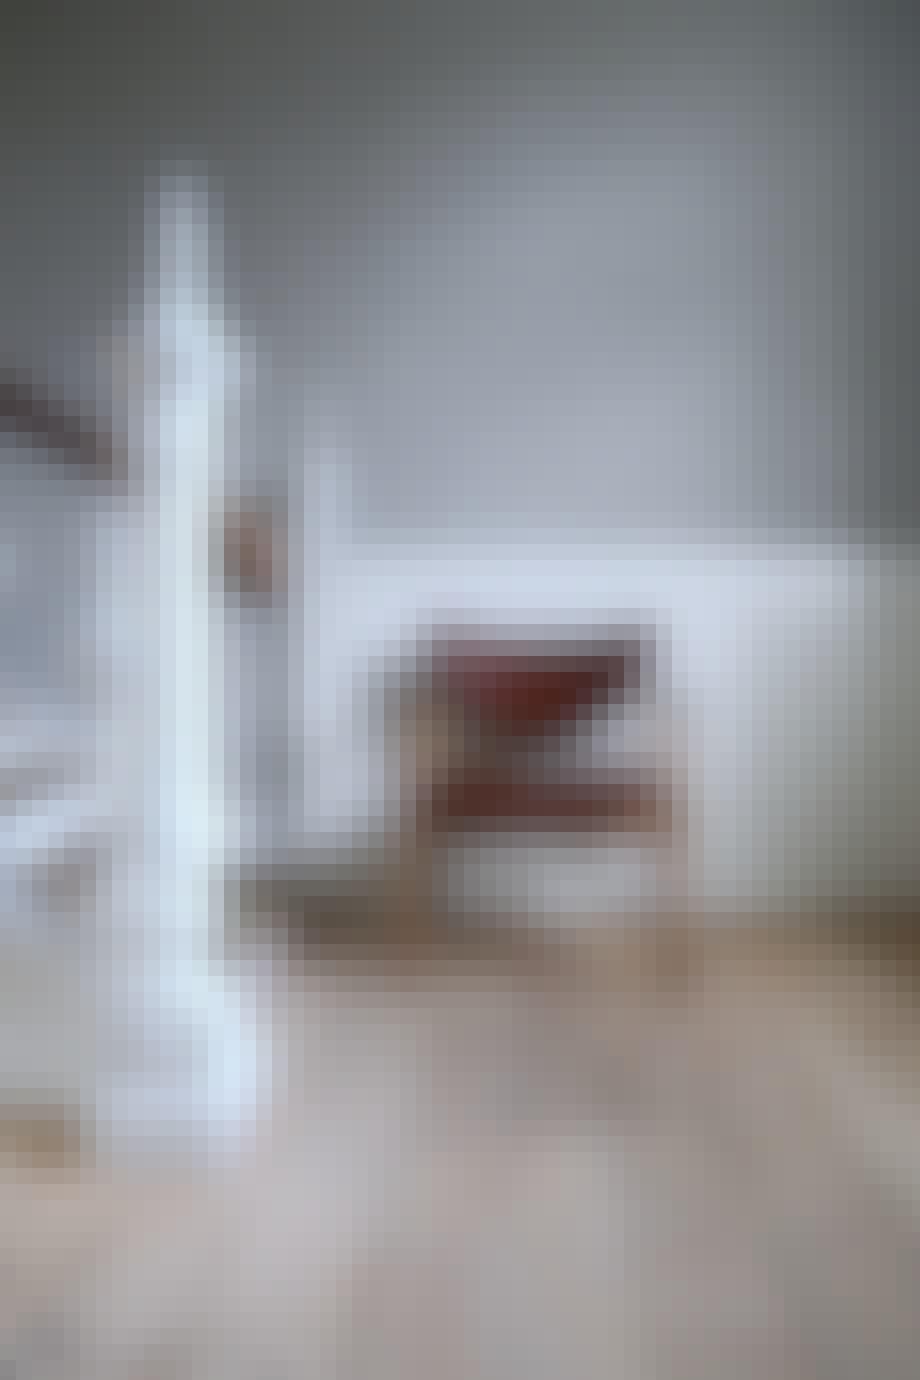 """48 Stol"" (1948). Materialer:Stel i teak/eg, valnød. Polstring i stof eller læder. Mål: B 69 cm x D 63 cm x H 80 cm. Vejl. pris: Fra 29.826 kr."